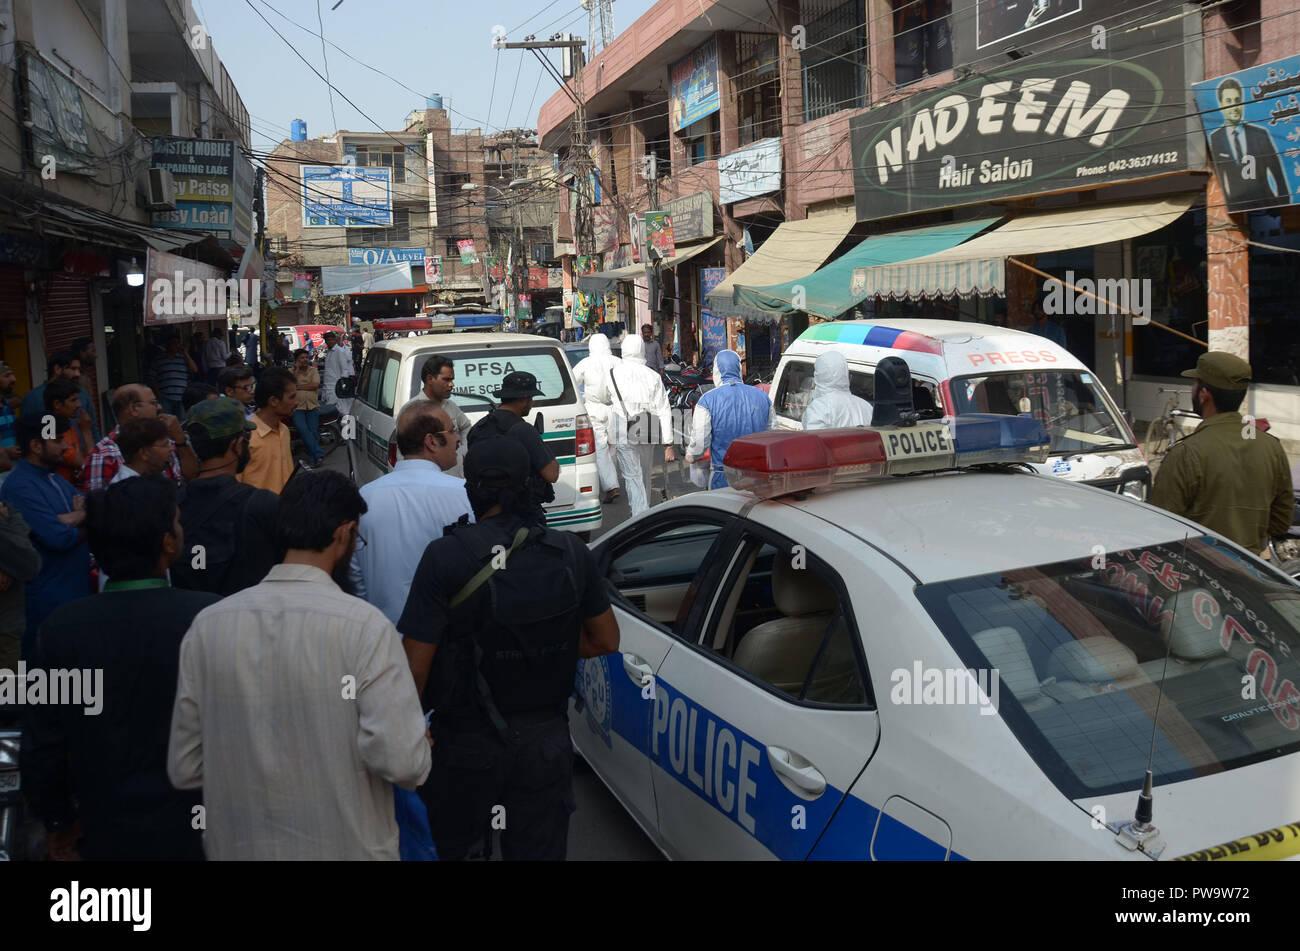 Punjab Police Stock Photos & Punjab Police Stock Images - Page 3 - Alamy